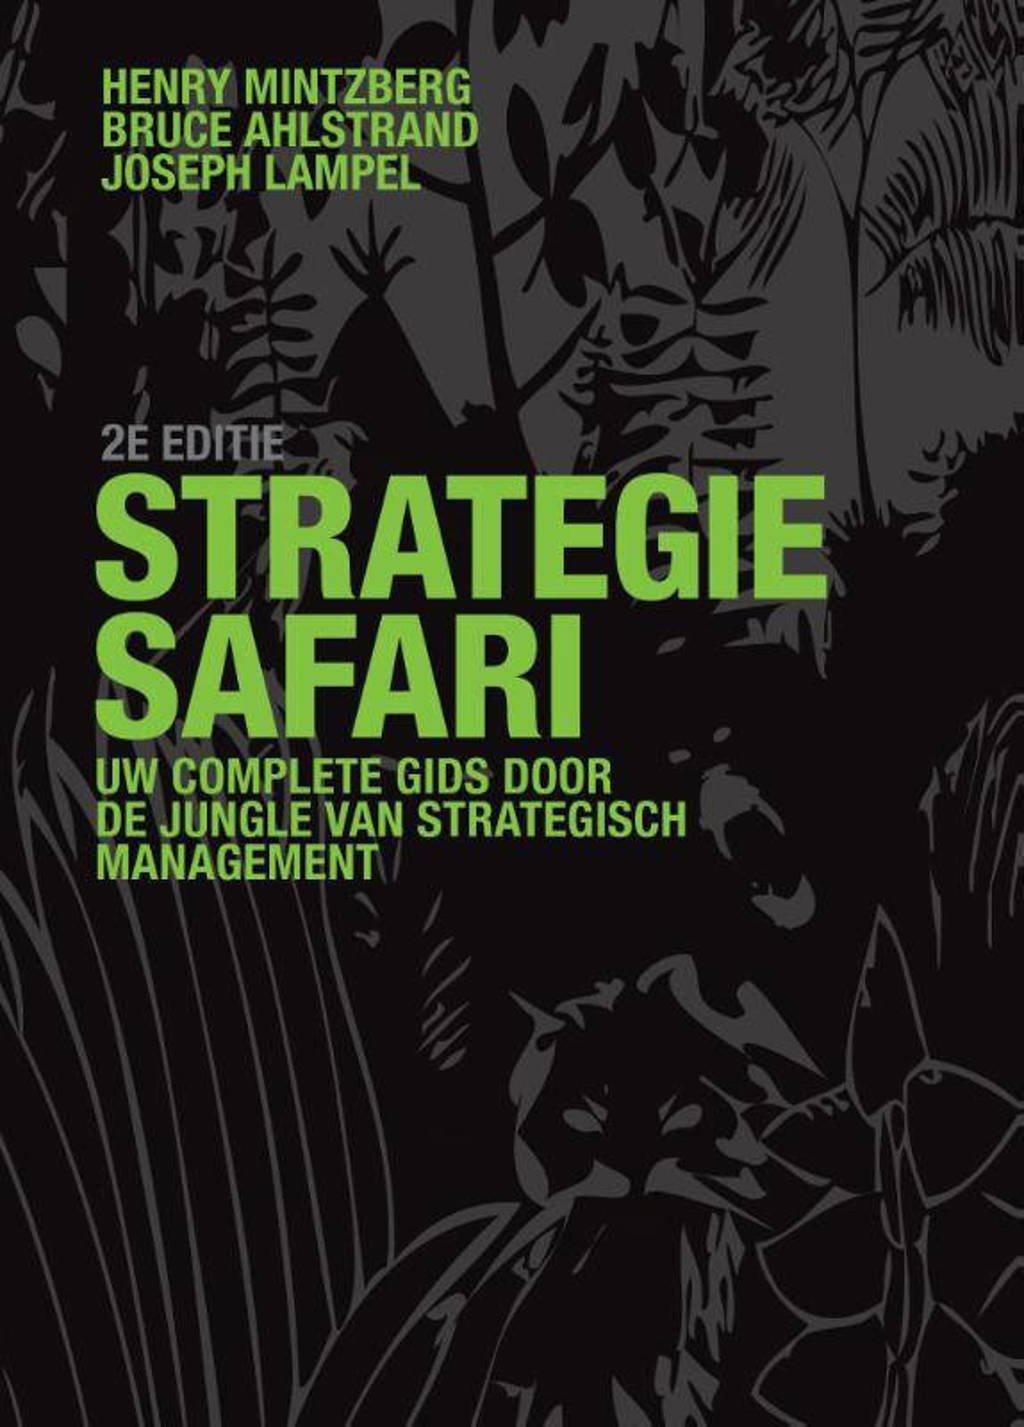 Strategie-safari - H. Mintzberg, J. Lampel en B. Ahlstrand